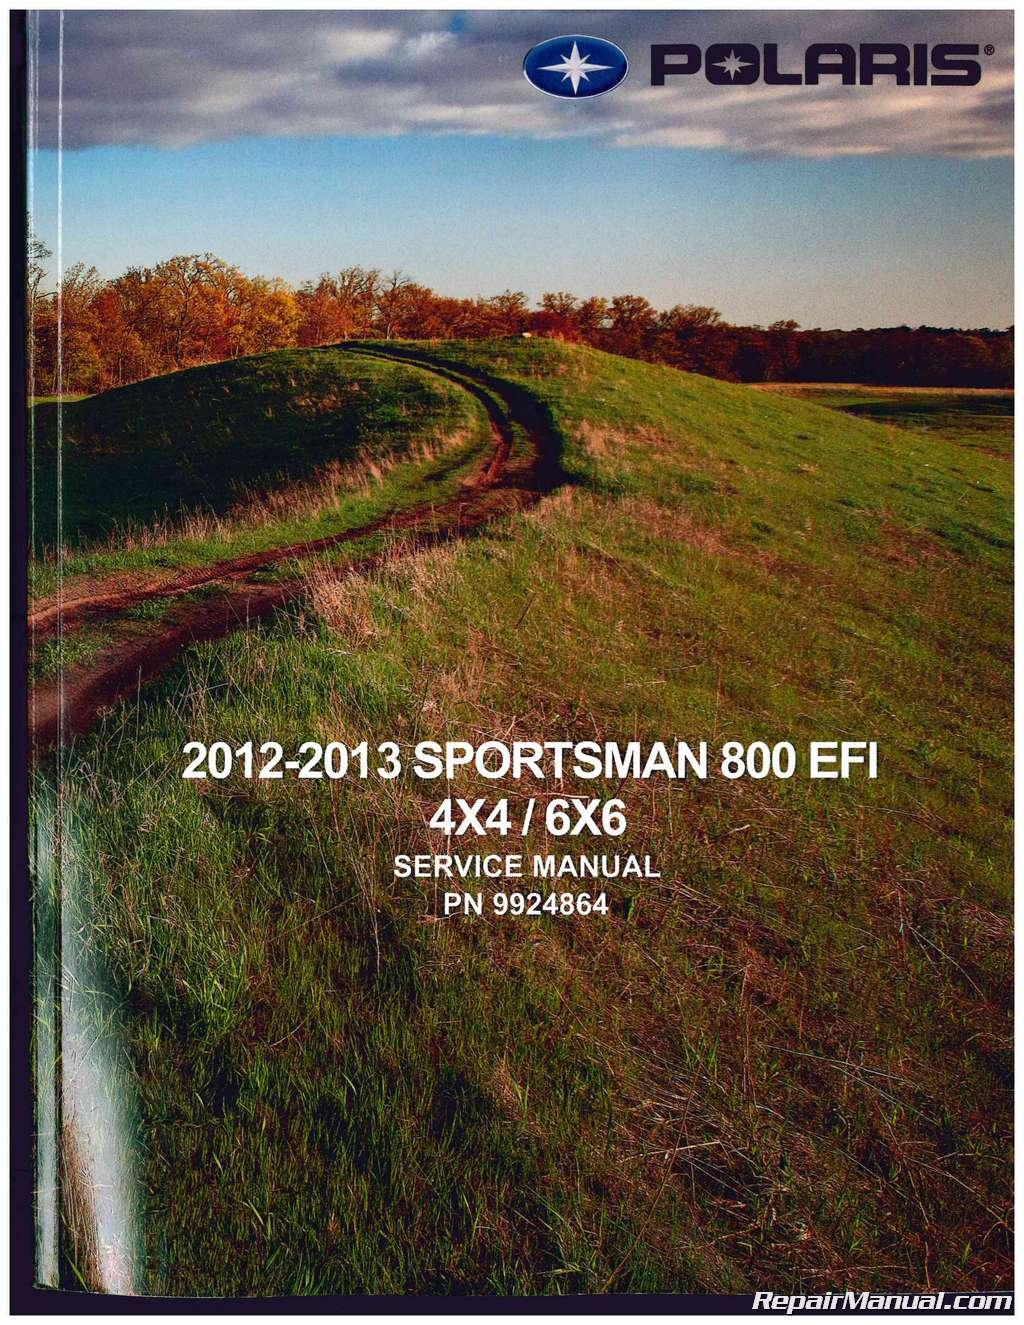 hight resolution of  wiring diagram 2012 2014 polaris sportsman 800 efi 4 x 4 6 x 6 big boss